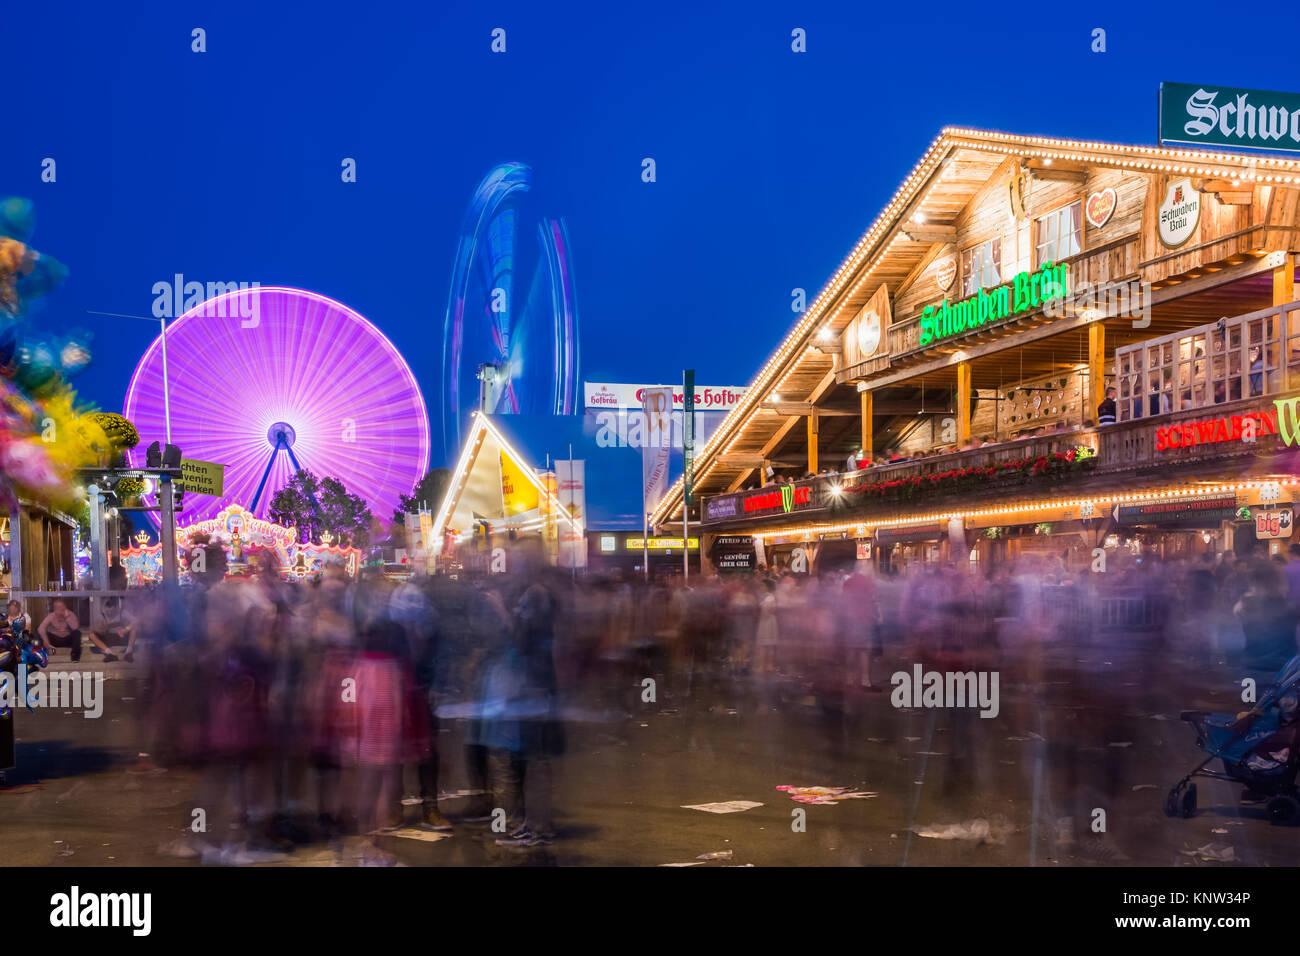 Bad Cannstatt Stuttgart Germany Volksfest Oktoberfest Rides Beer Tent - Stock Image